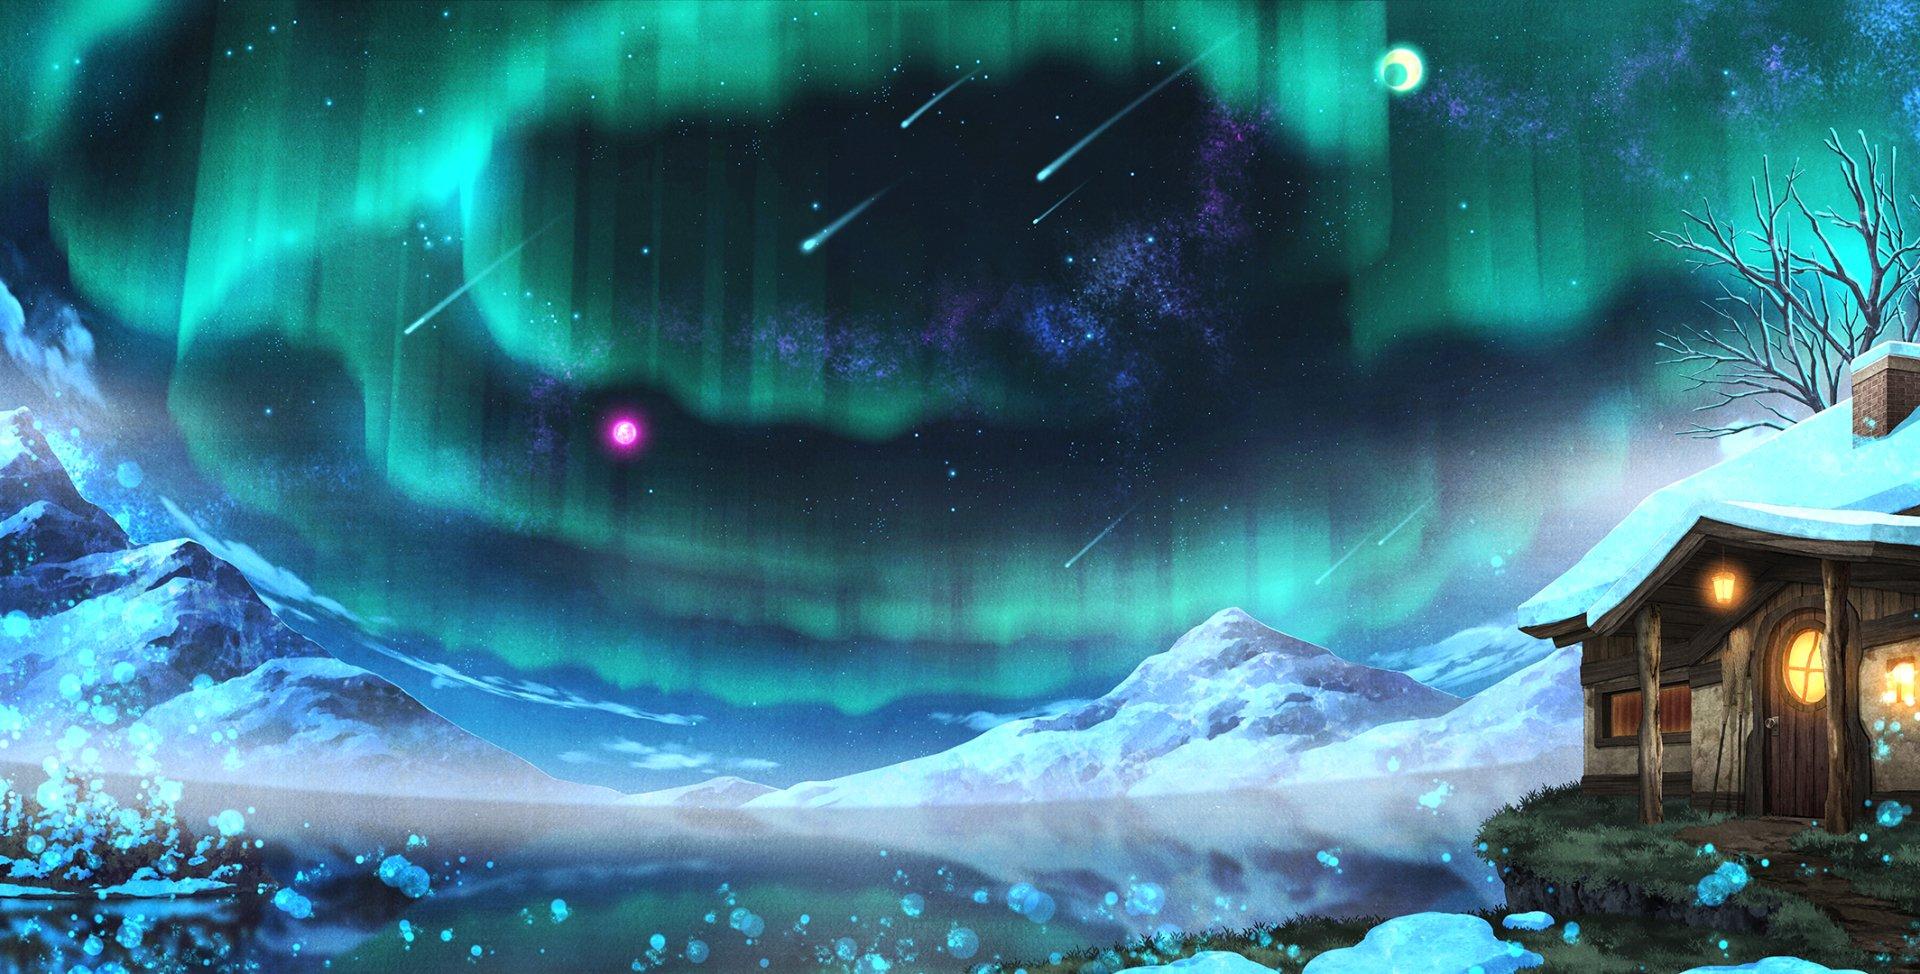 Anime - Original  Mountain House Snow Landscape Night Shooting Star Aurora Borealis Wallpaper